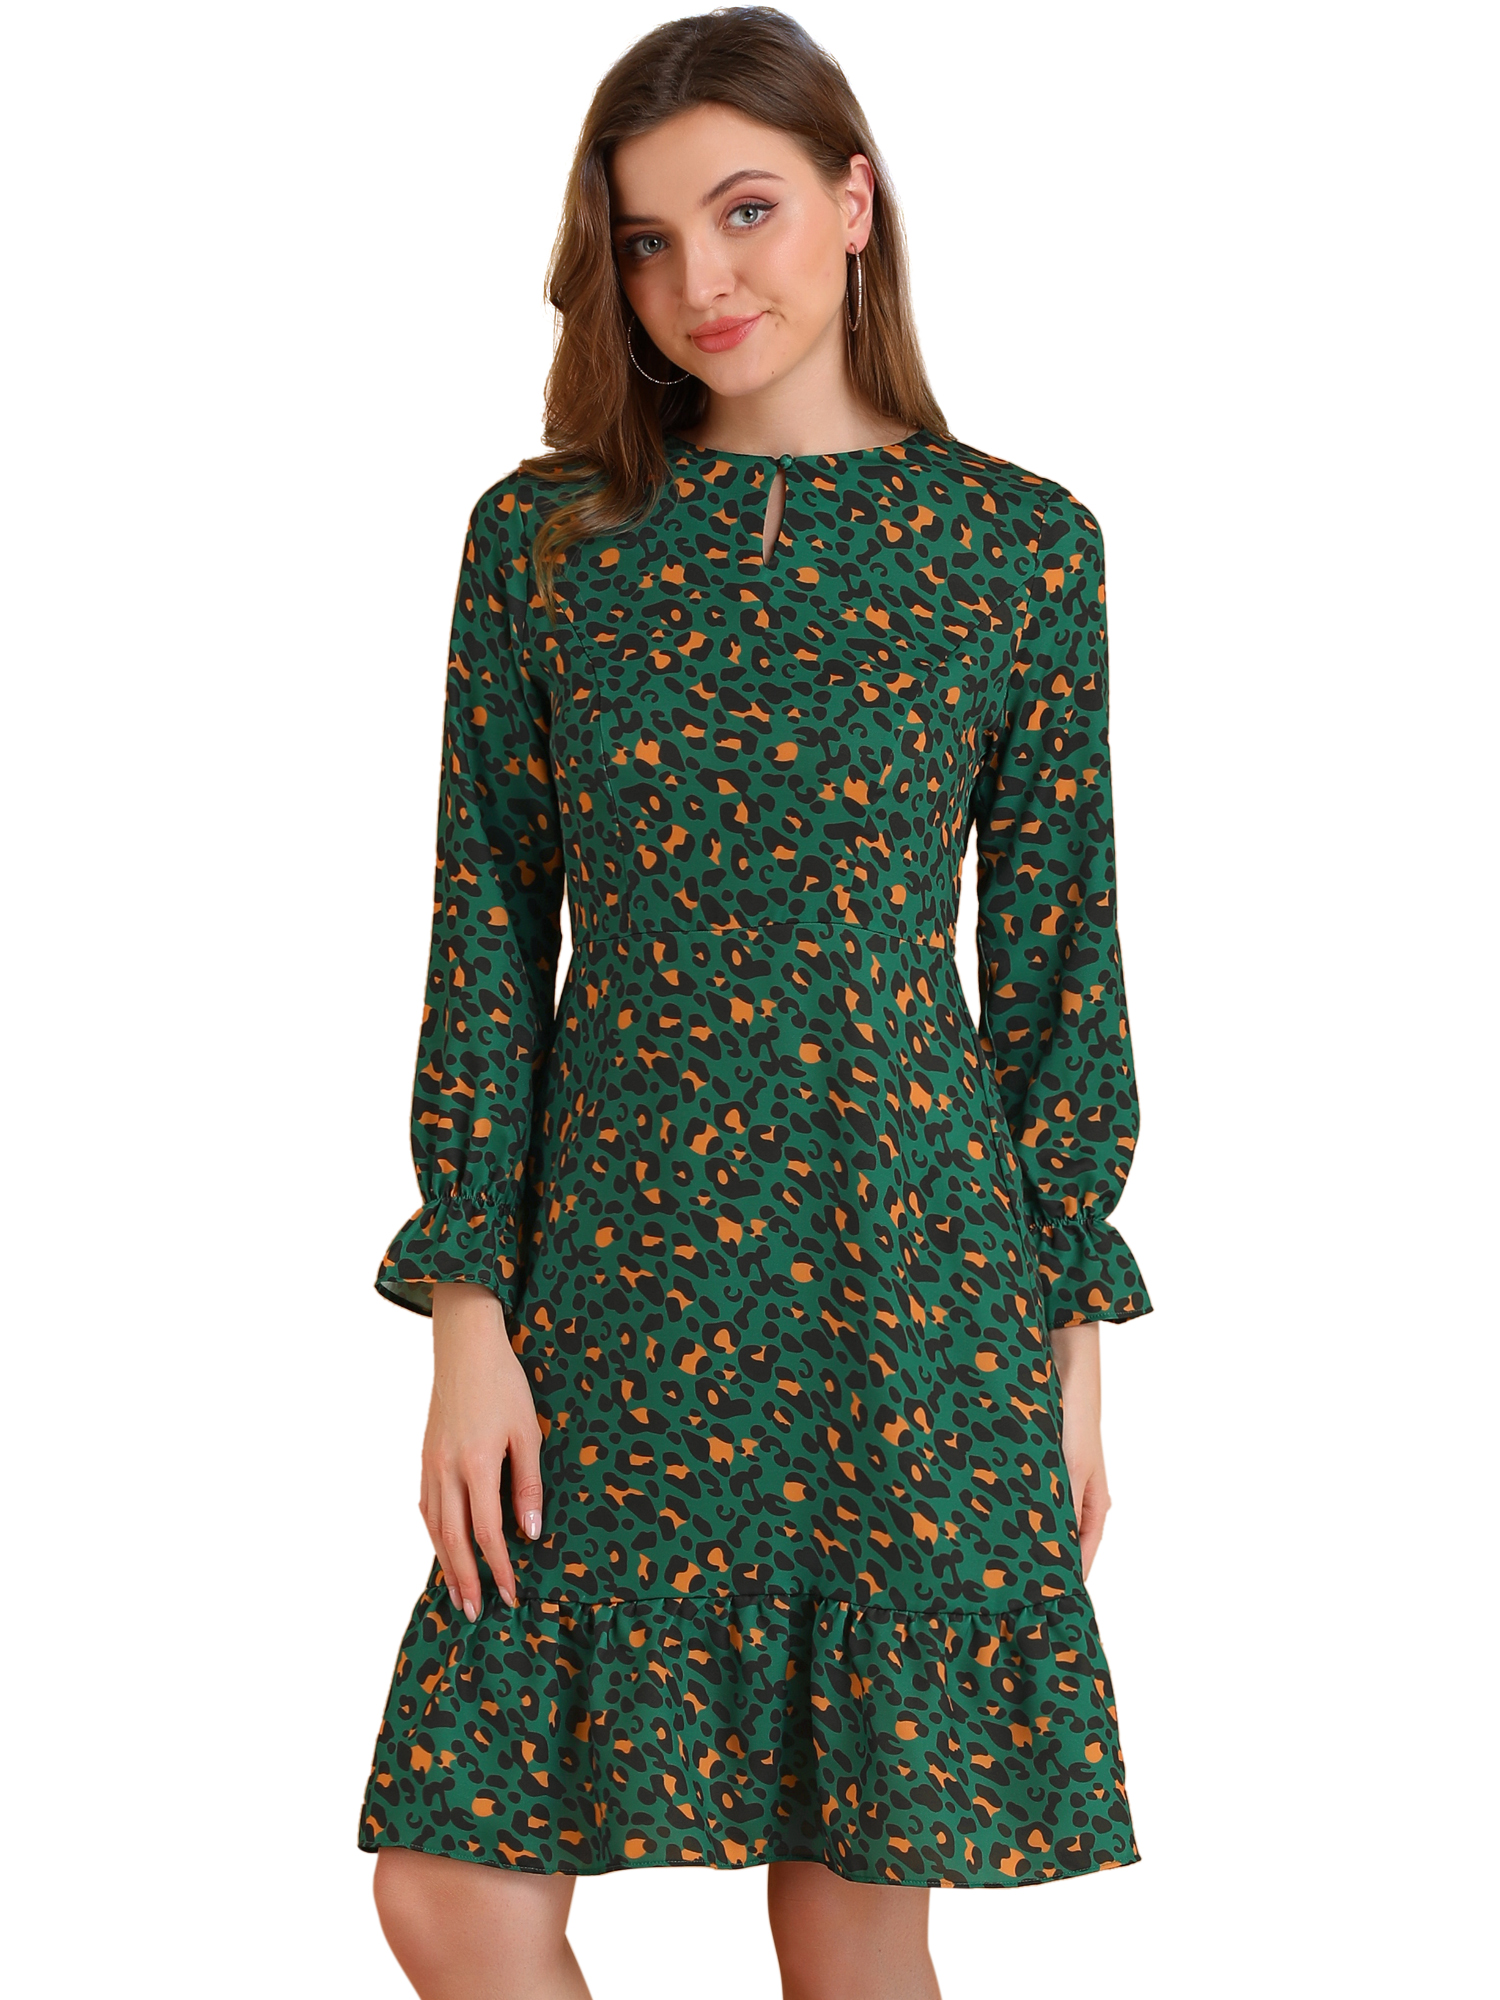 Women's Leopard Print Long Sleeve Keyhole Ruffle Hem Dress Green XS (US 2)